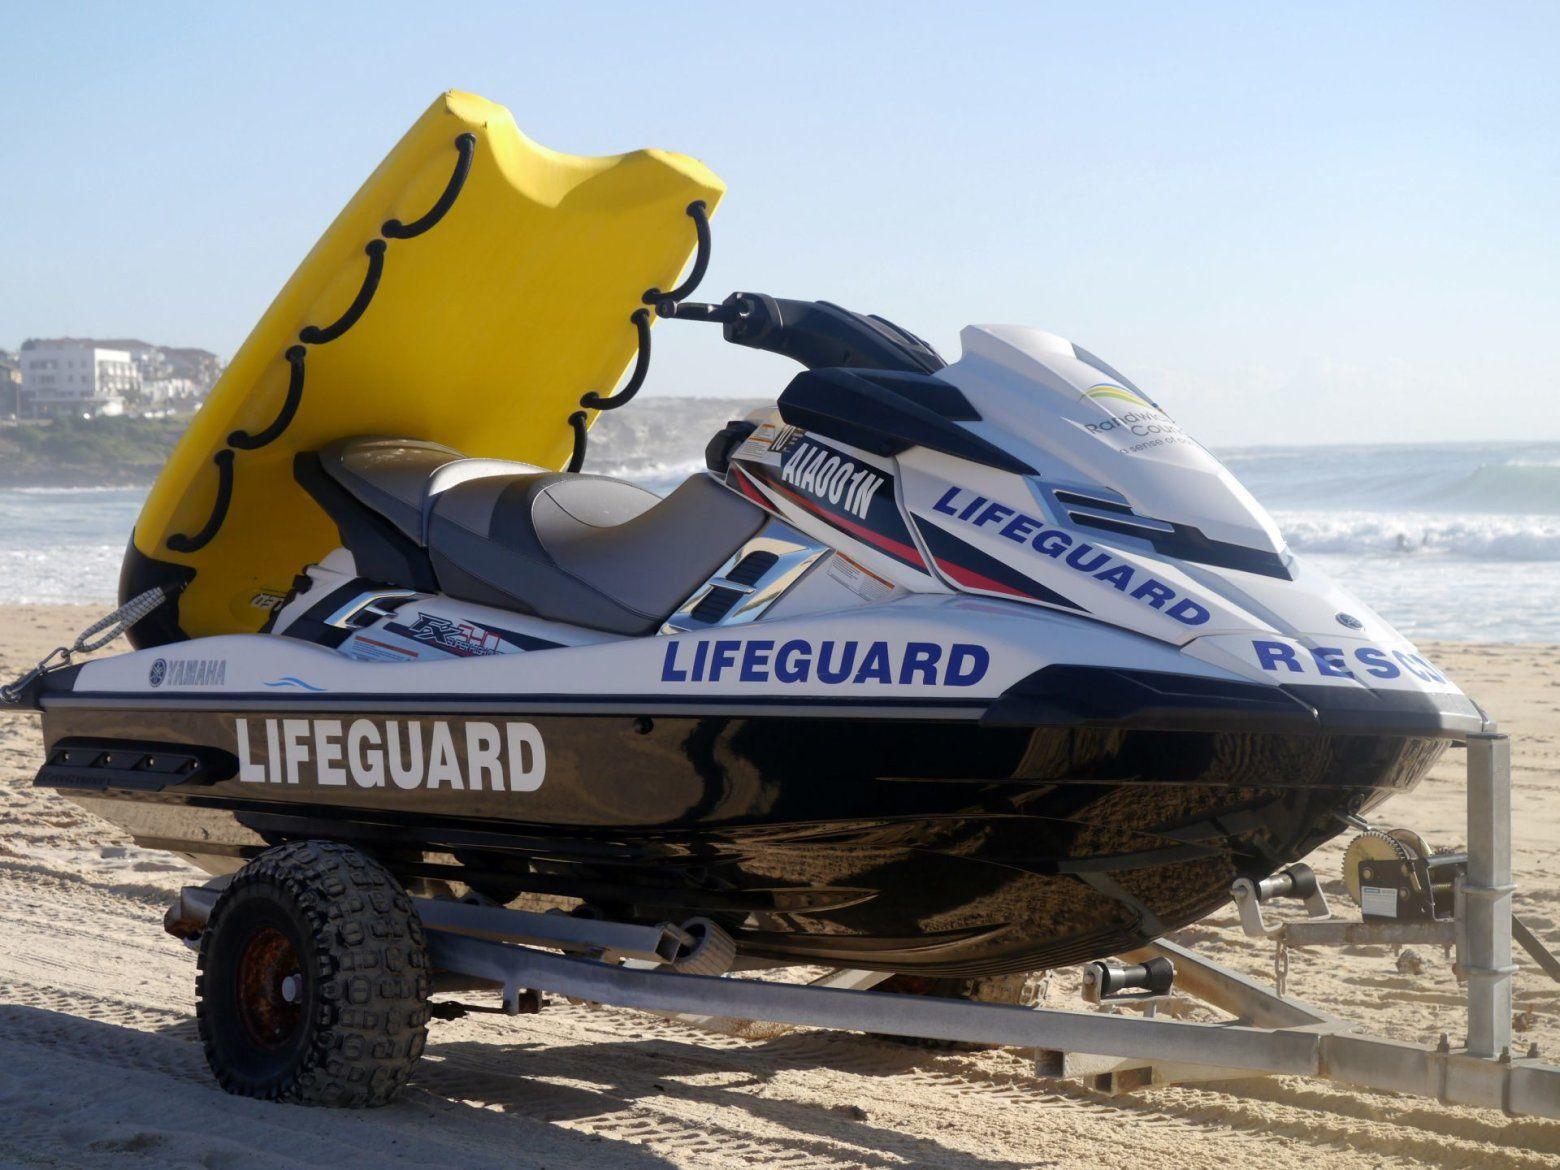 Lifeguard Rescue, Jet ski, Surfing, Ocean, Waves, Big